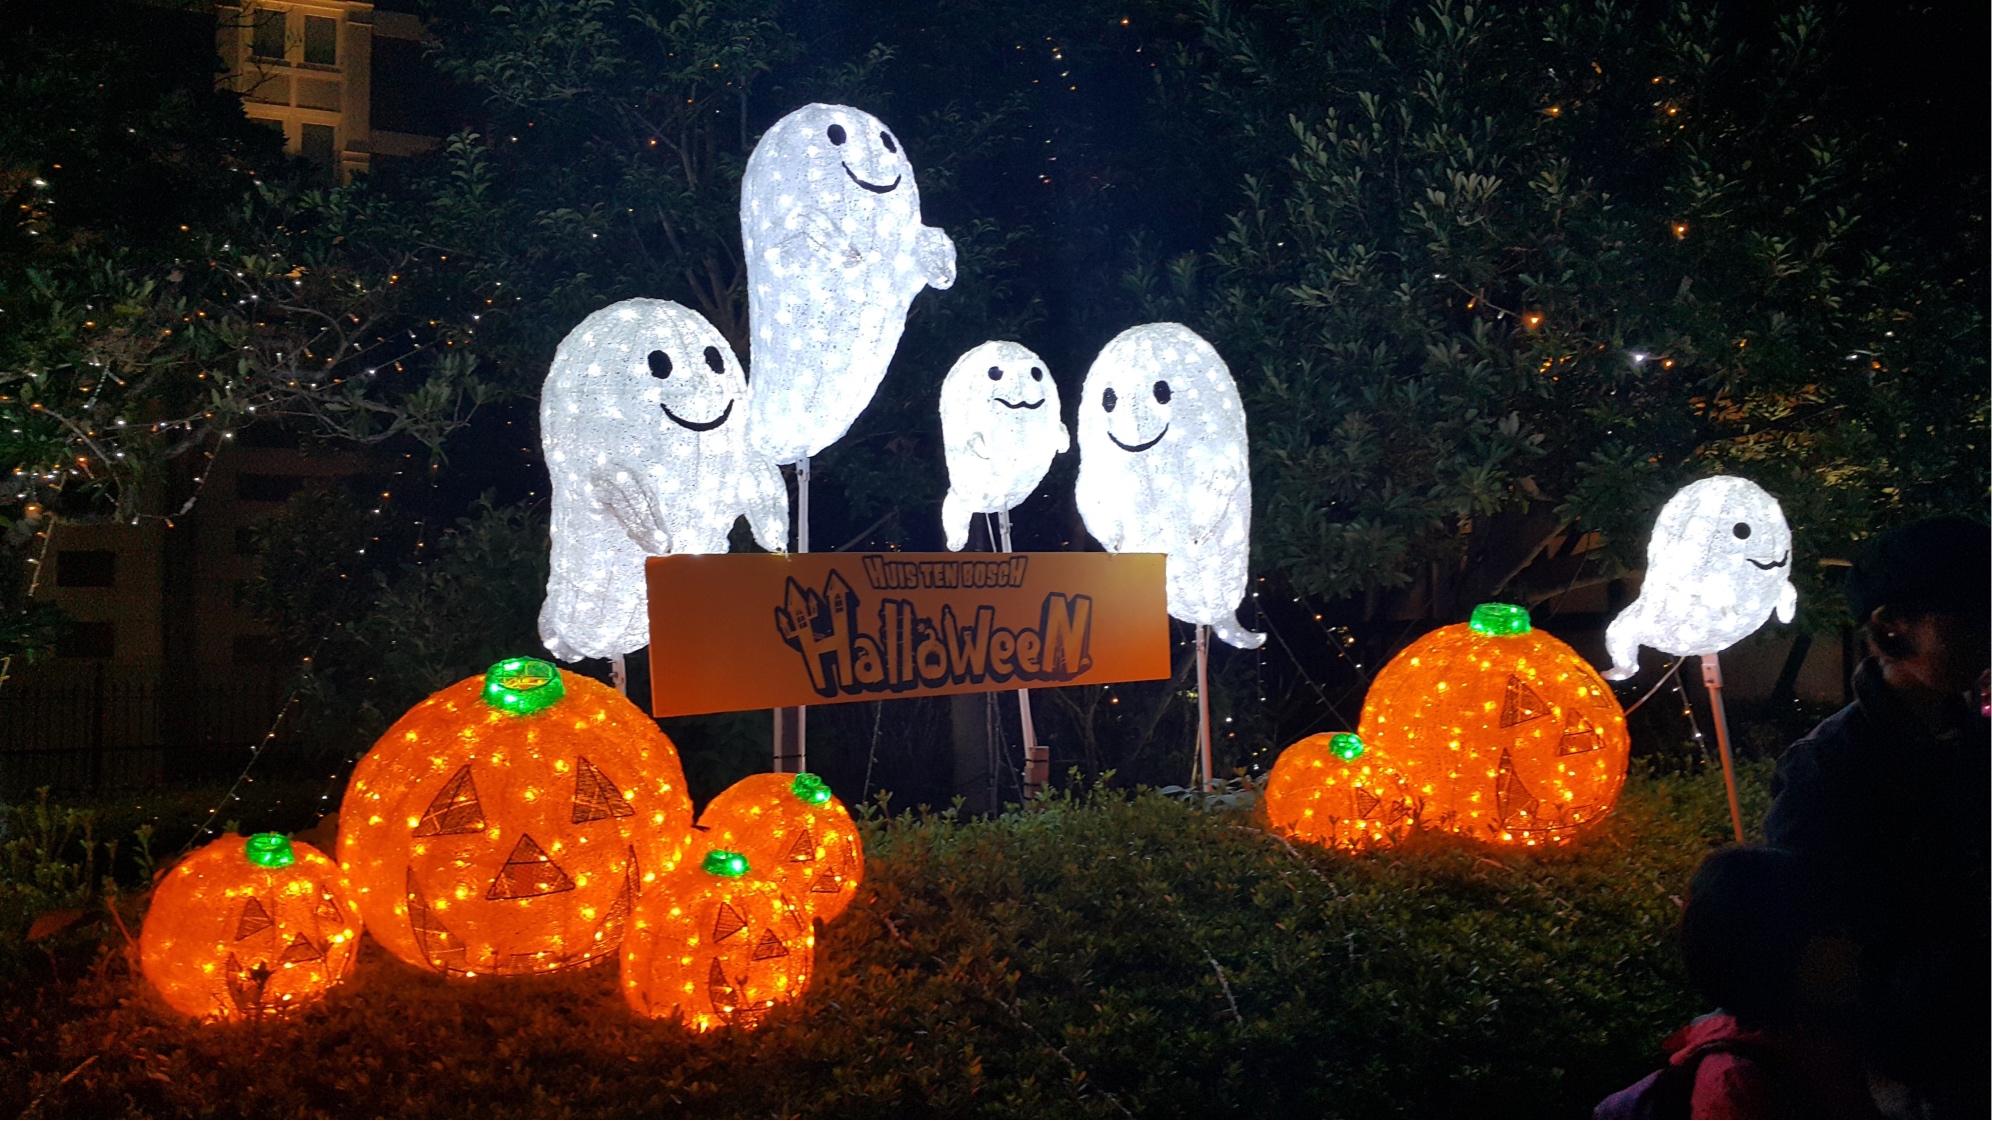 Halloween display of lit up ghosts and pumpkins - Halloween ideas in Essex